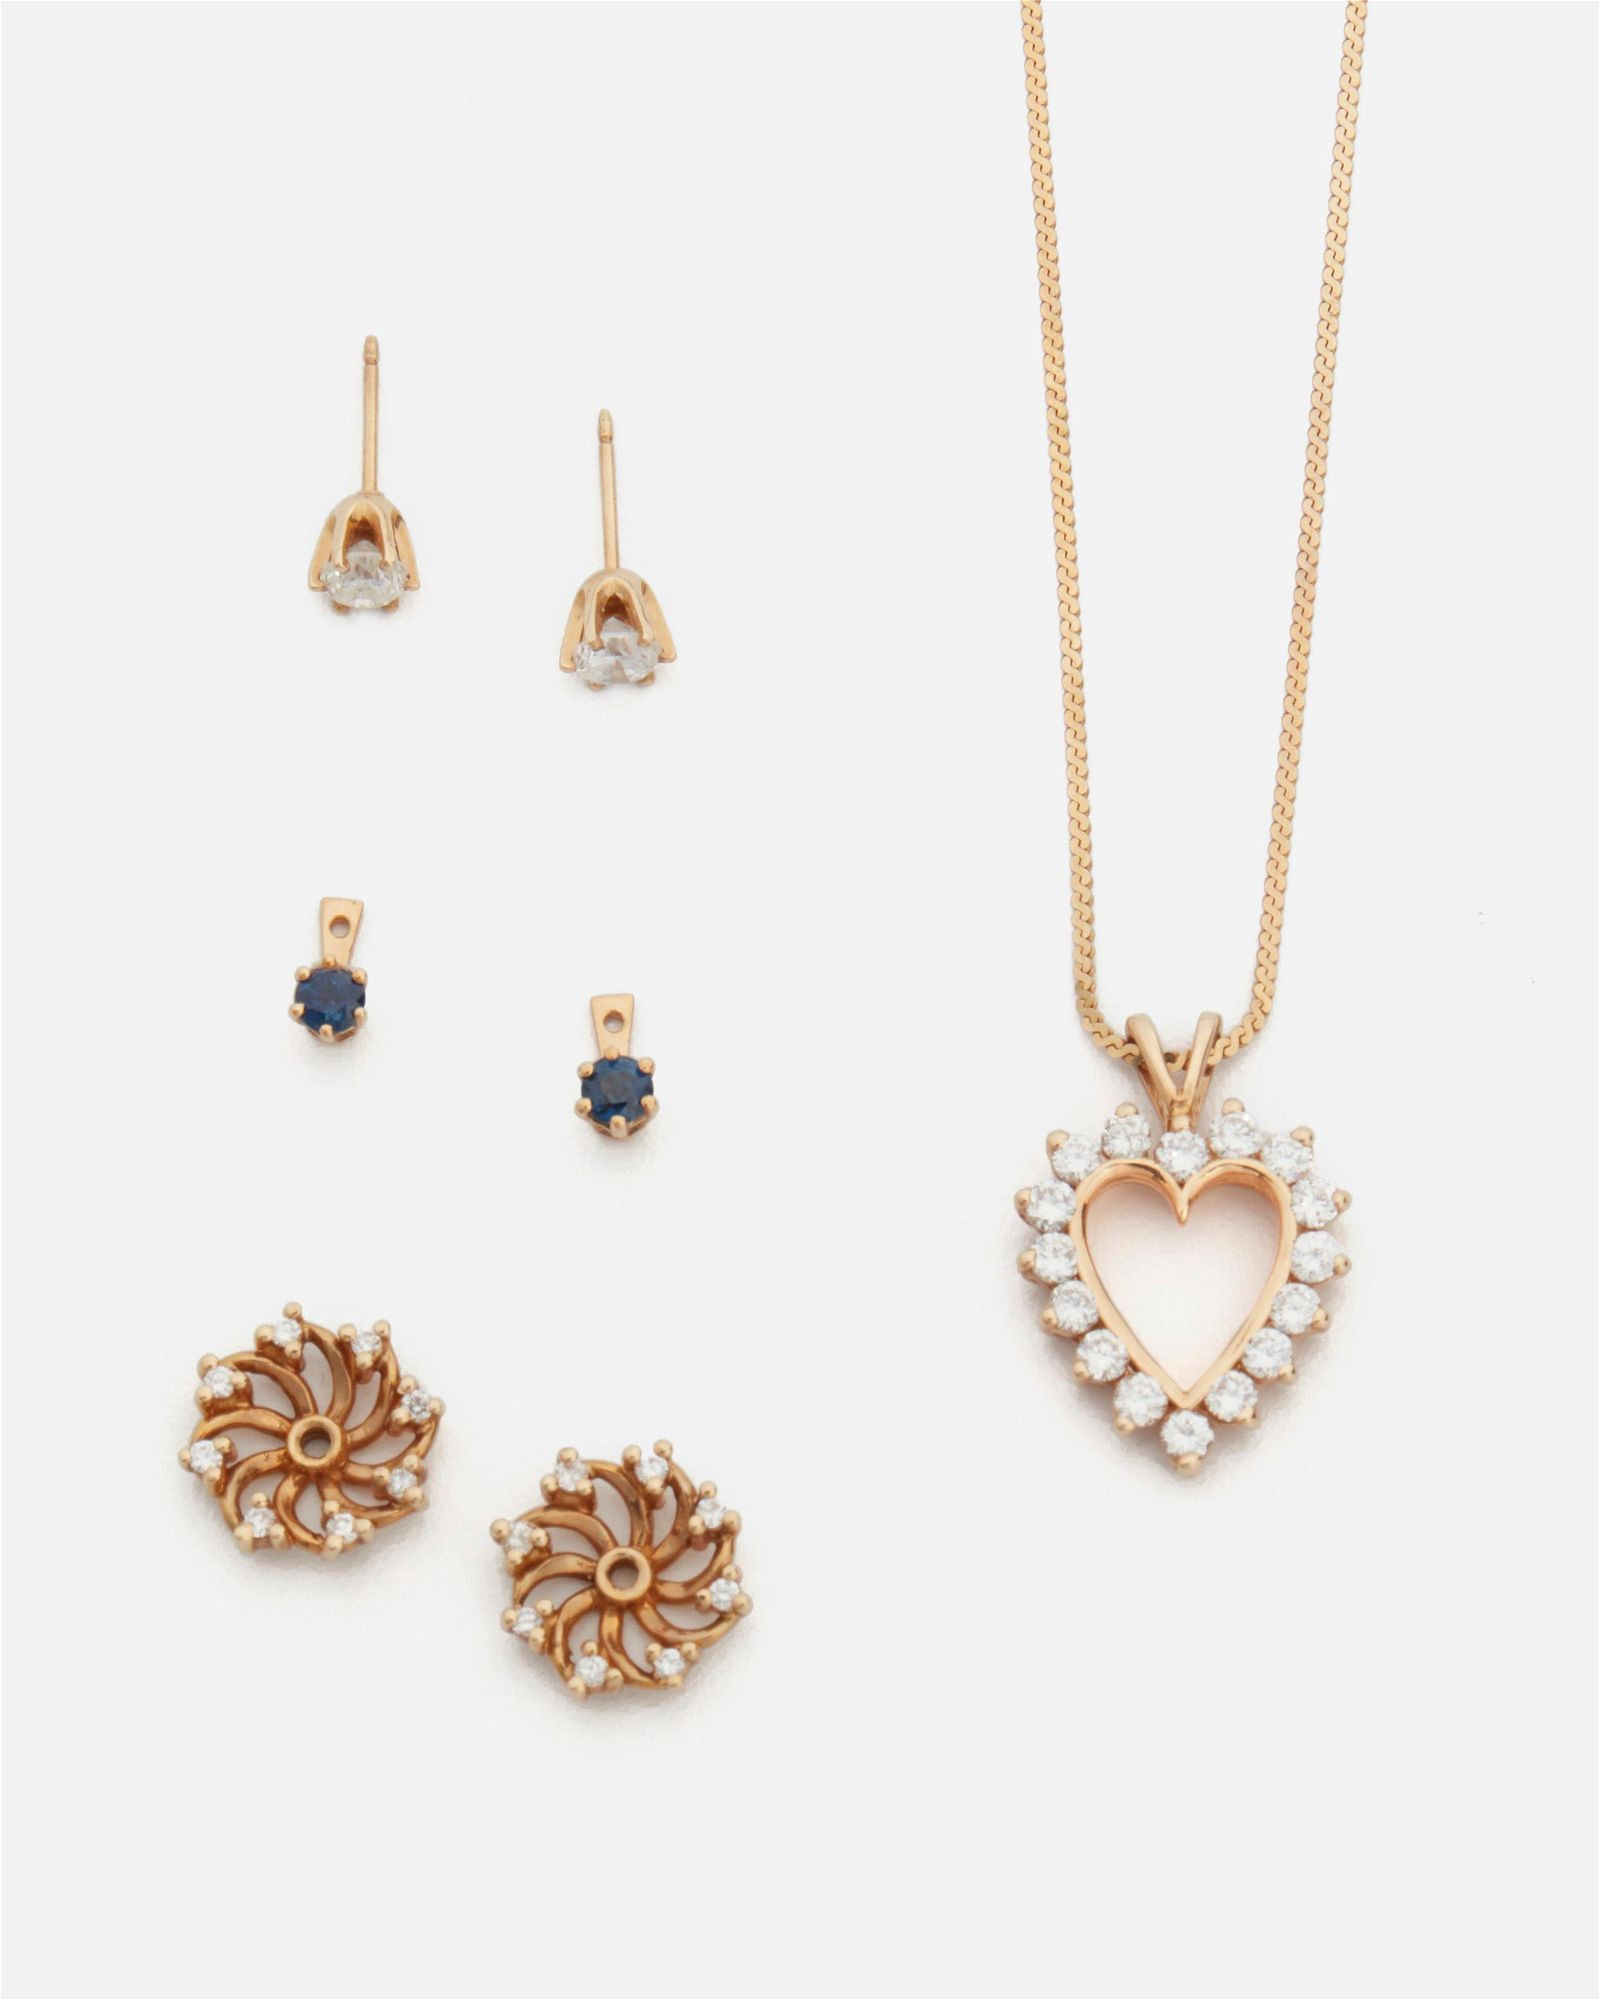 A group of diamond jewelry